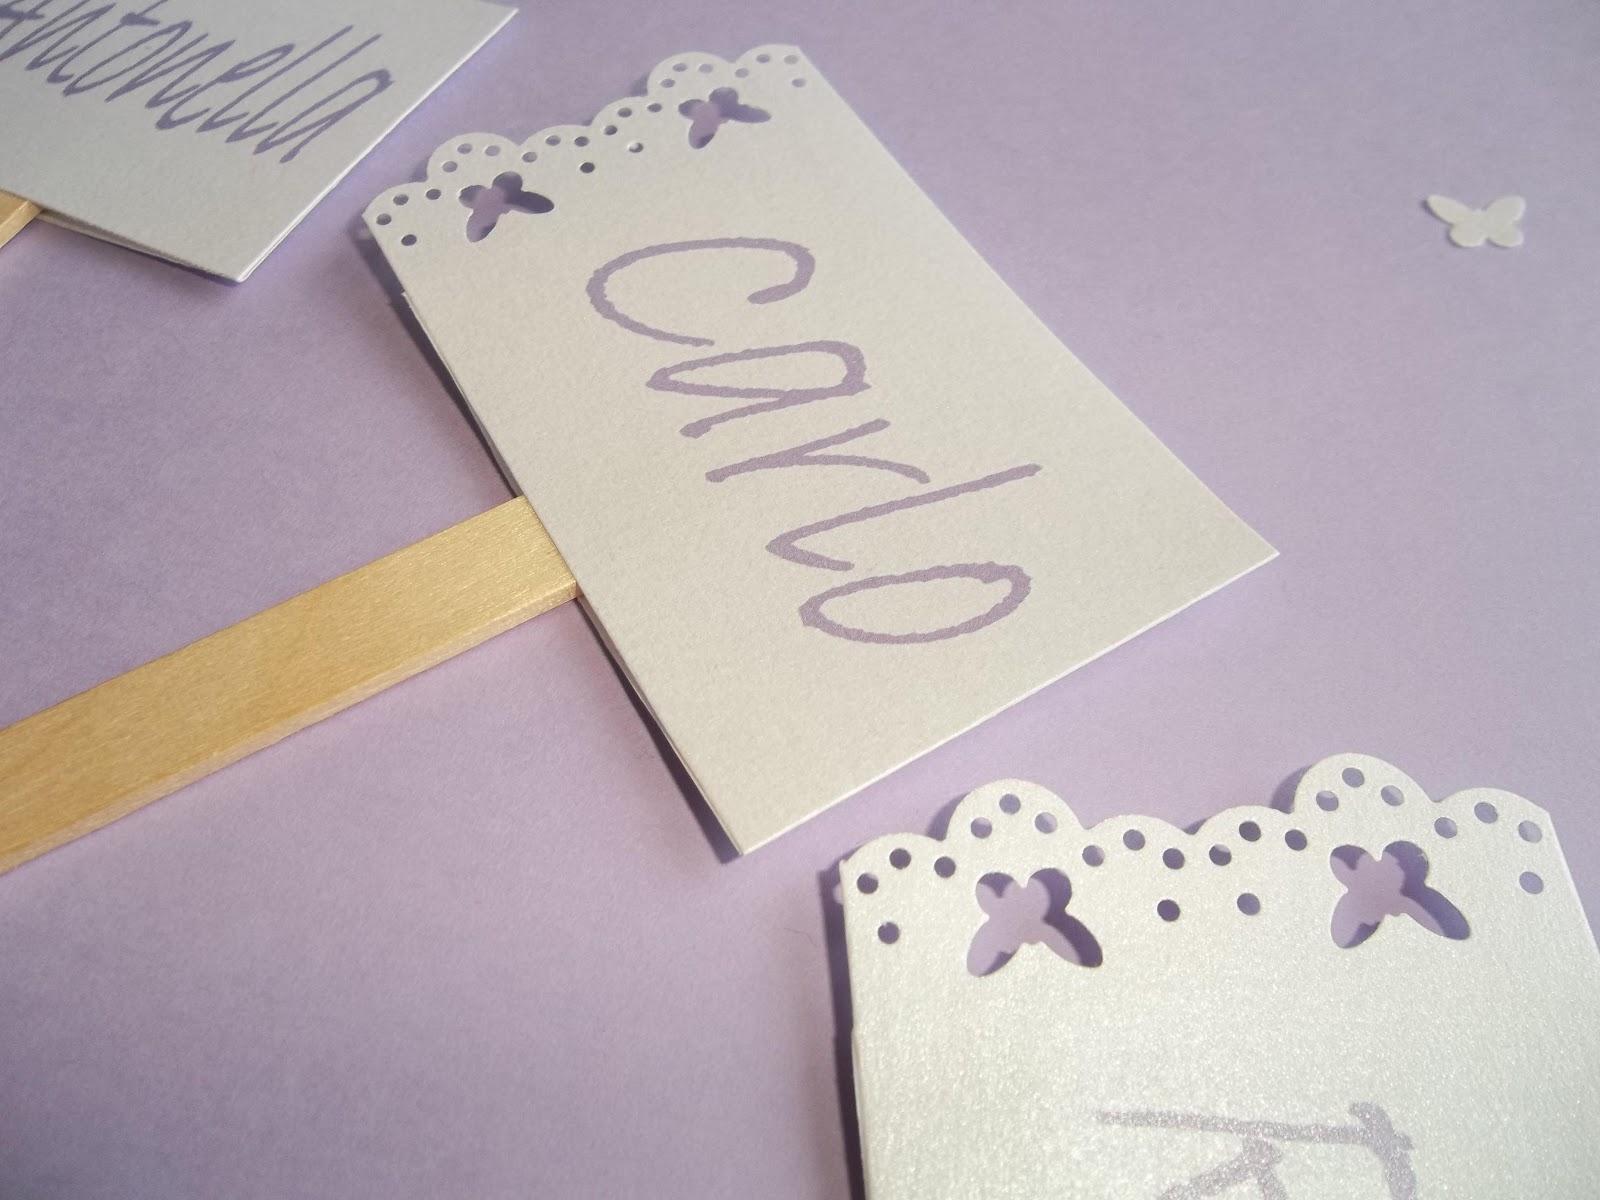 Segnaposto Matrimonio In Legno : Sara crea segnaposto matrimonio con palettina in legno